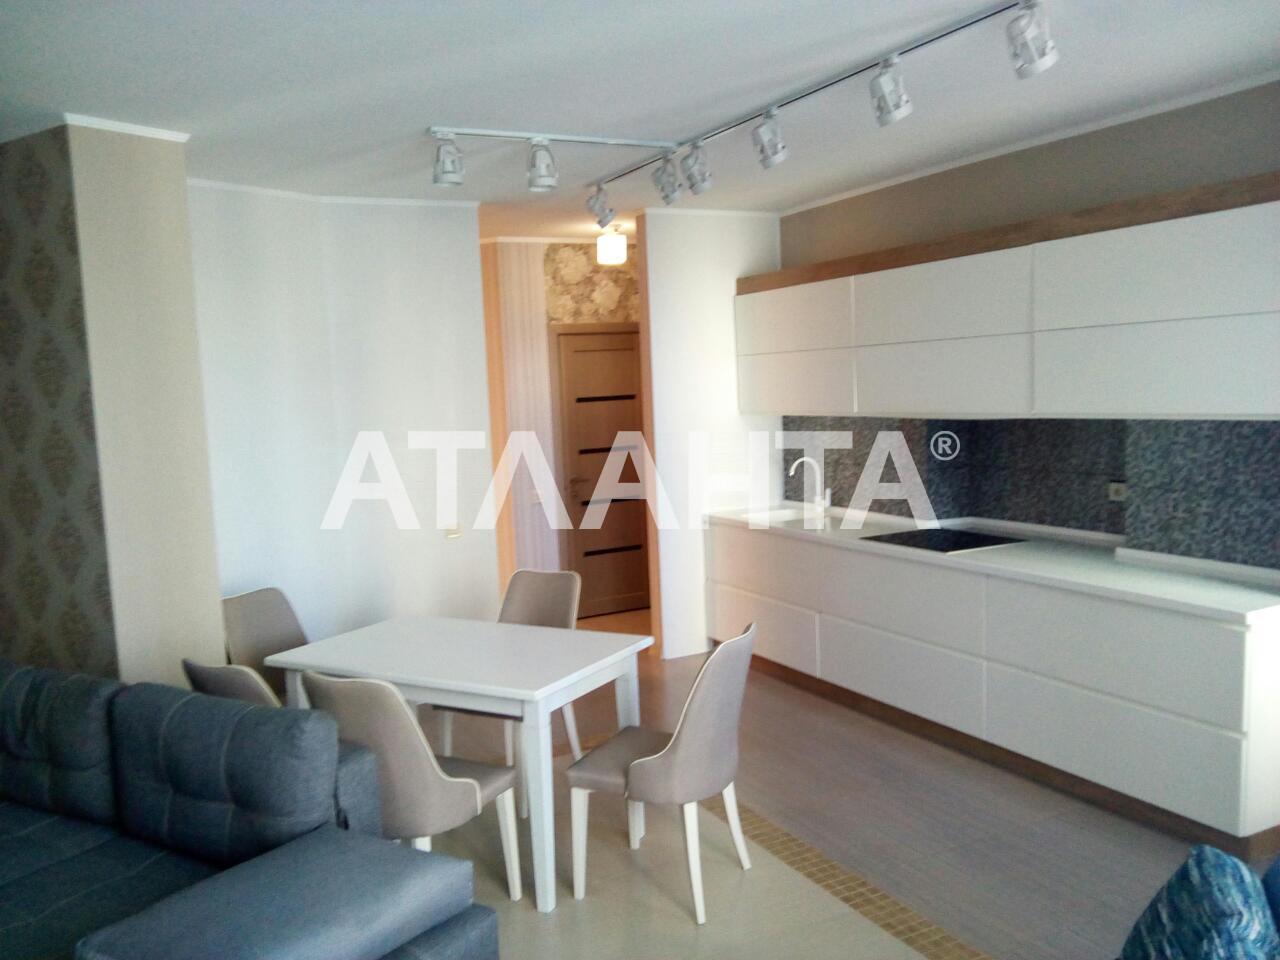 Продается 3-комнатная Квартира на ул. Просп. Глушкова — 139 000 у.е.